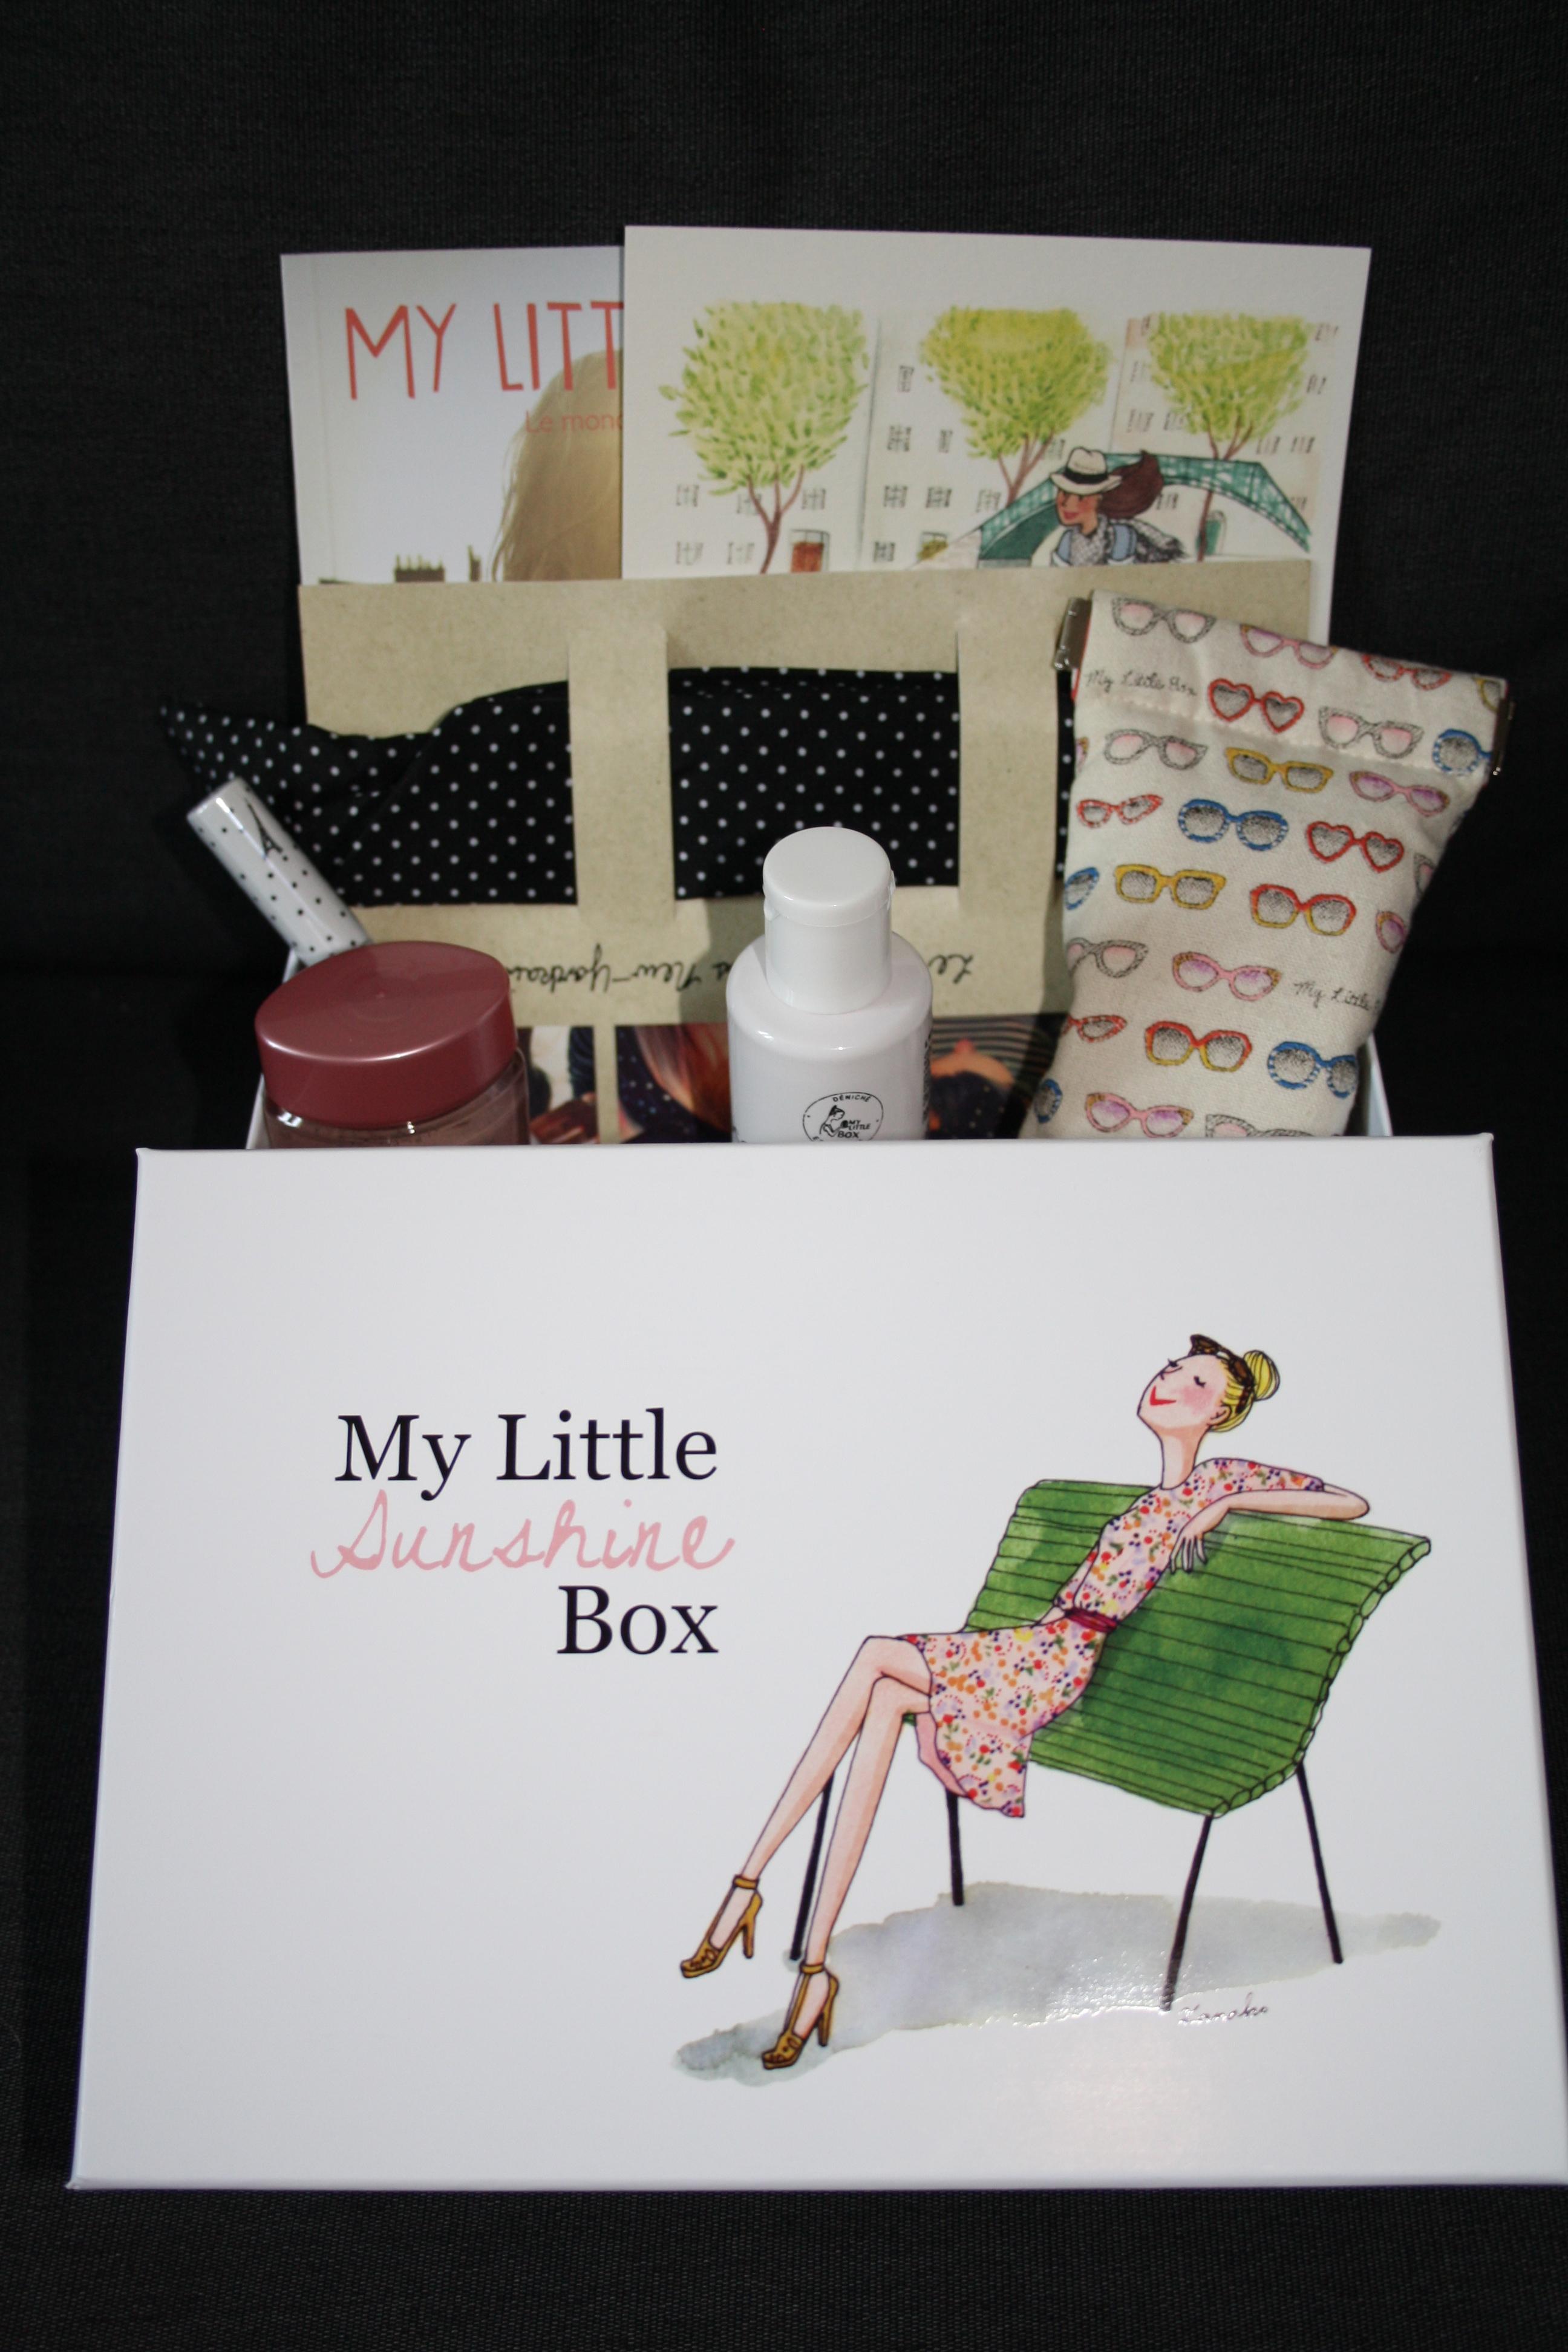 My Little SUNSHINE Box - Mathilde et Gourmandises